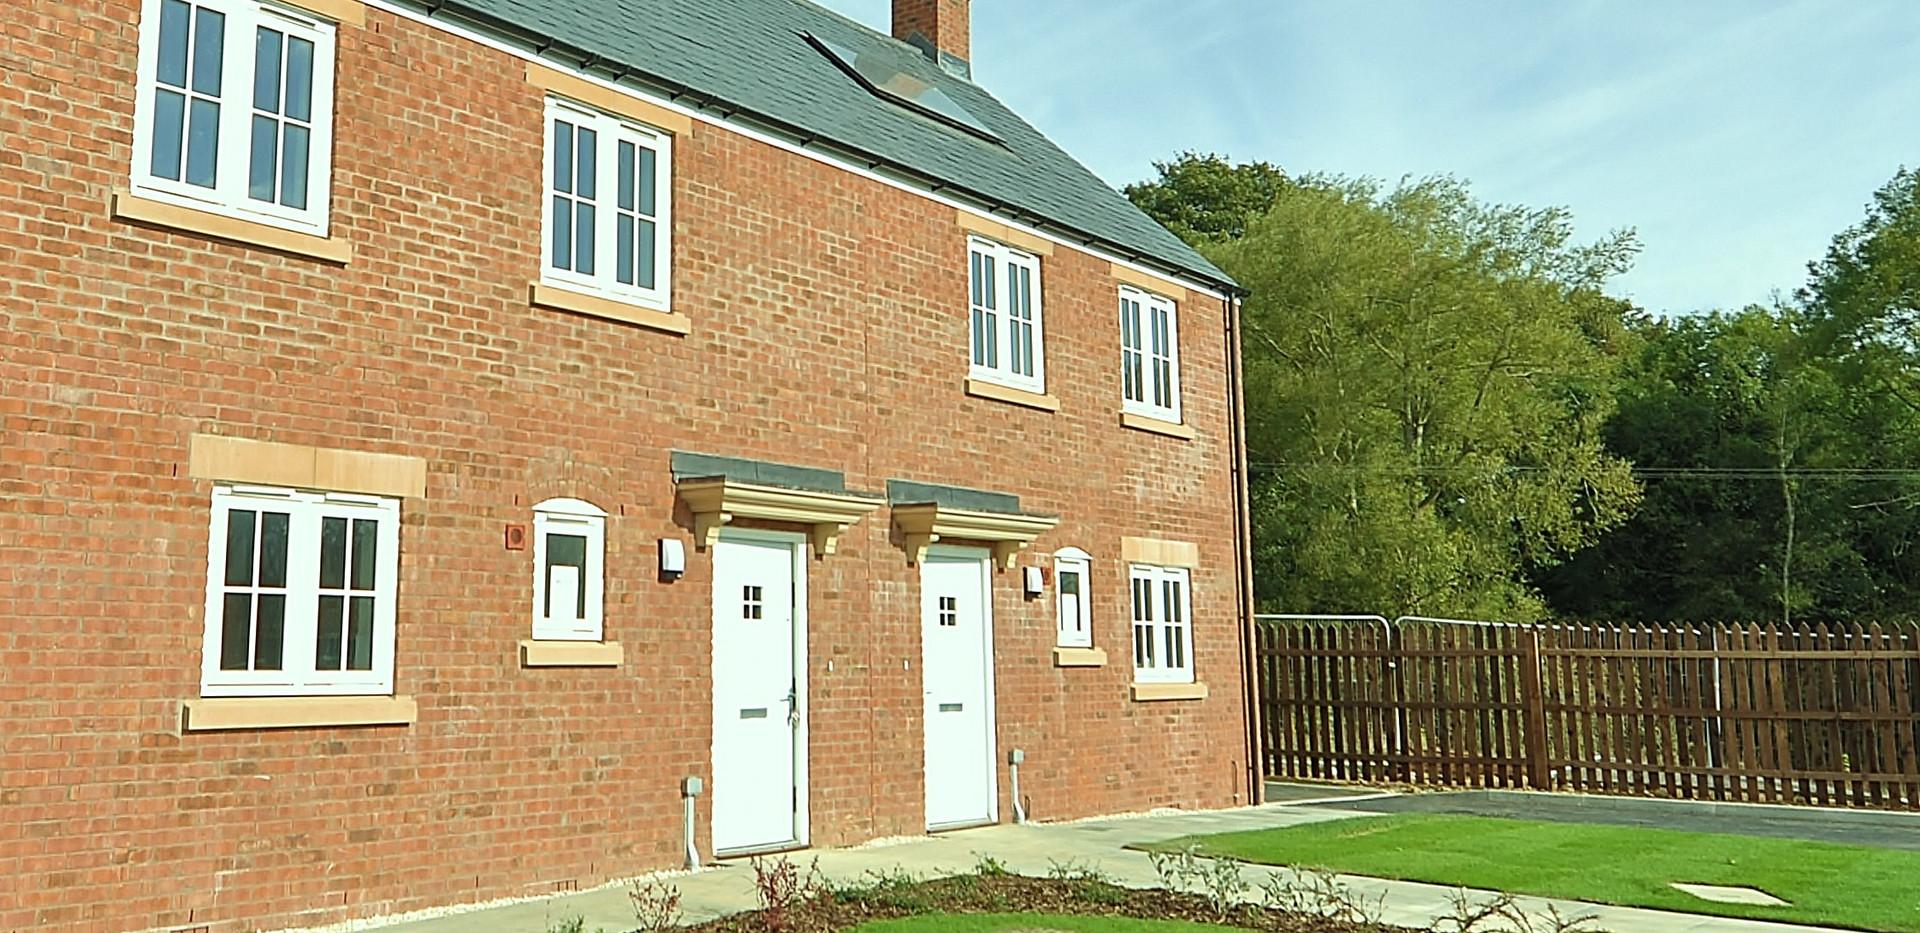 Erbington, Worcestershire